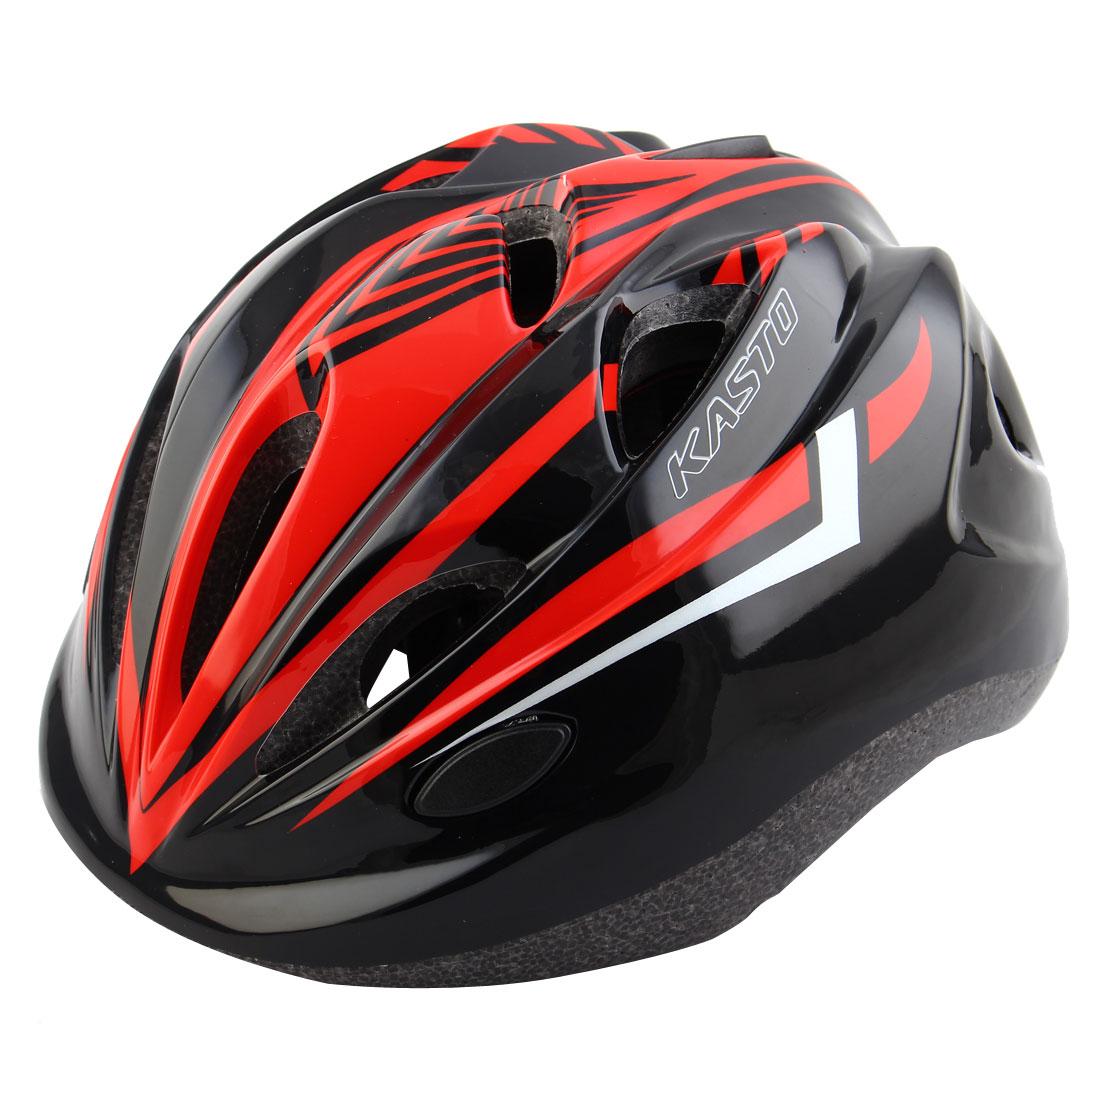 Boys Girls LED Light Adjustable Belt Removable Liner Road Cycling Mountain Bicycle Cap Safety Bike Helmet Red Black